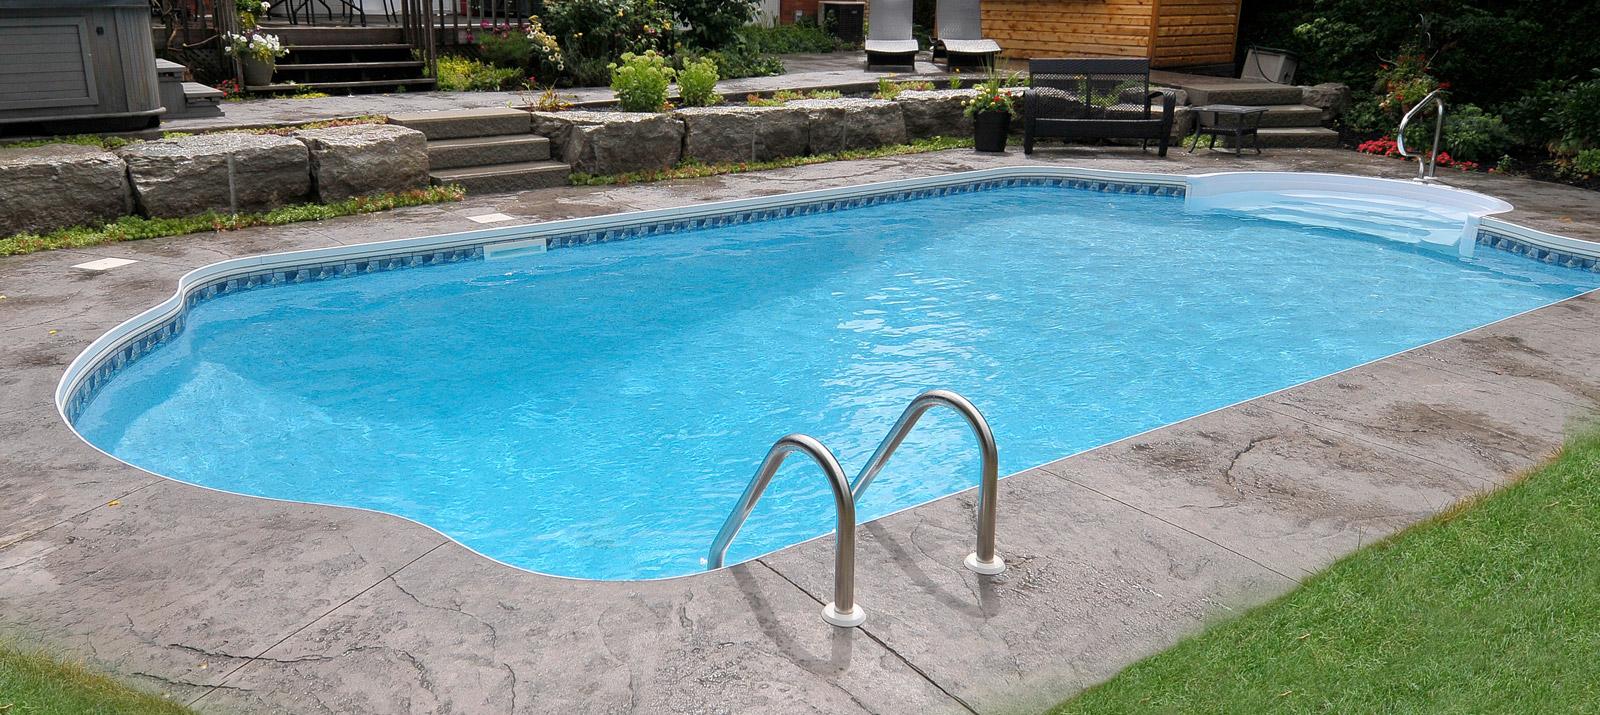 Pool restoration renovation buds spas pools ancaster dundas hamilton burlington - Pool restoration ...